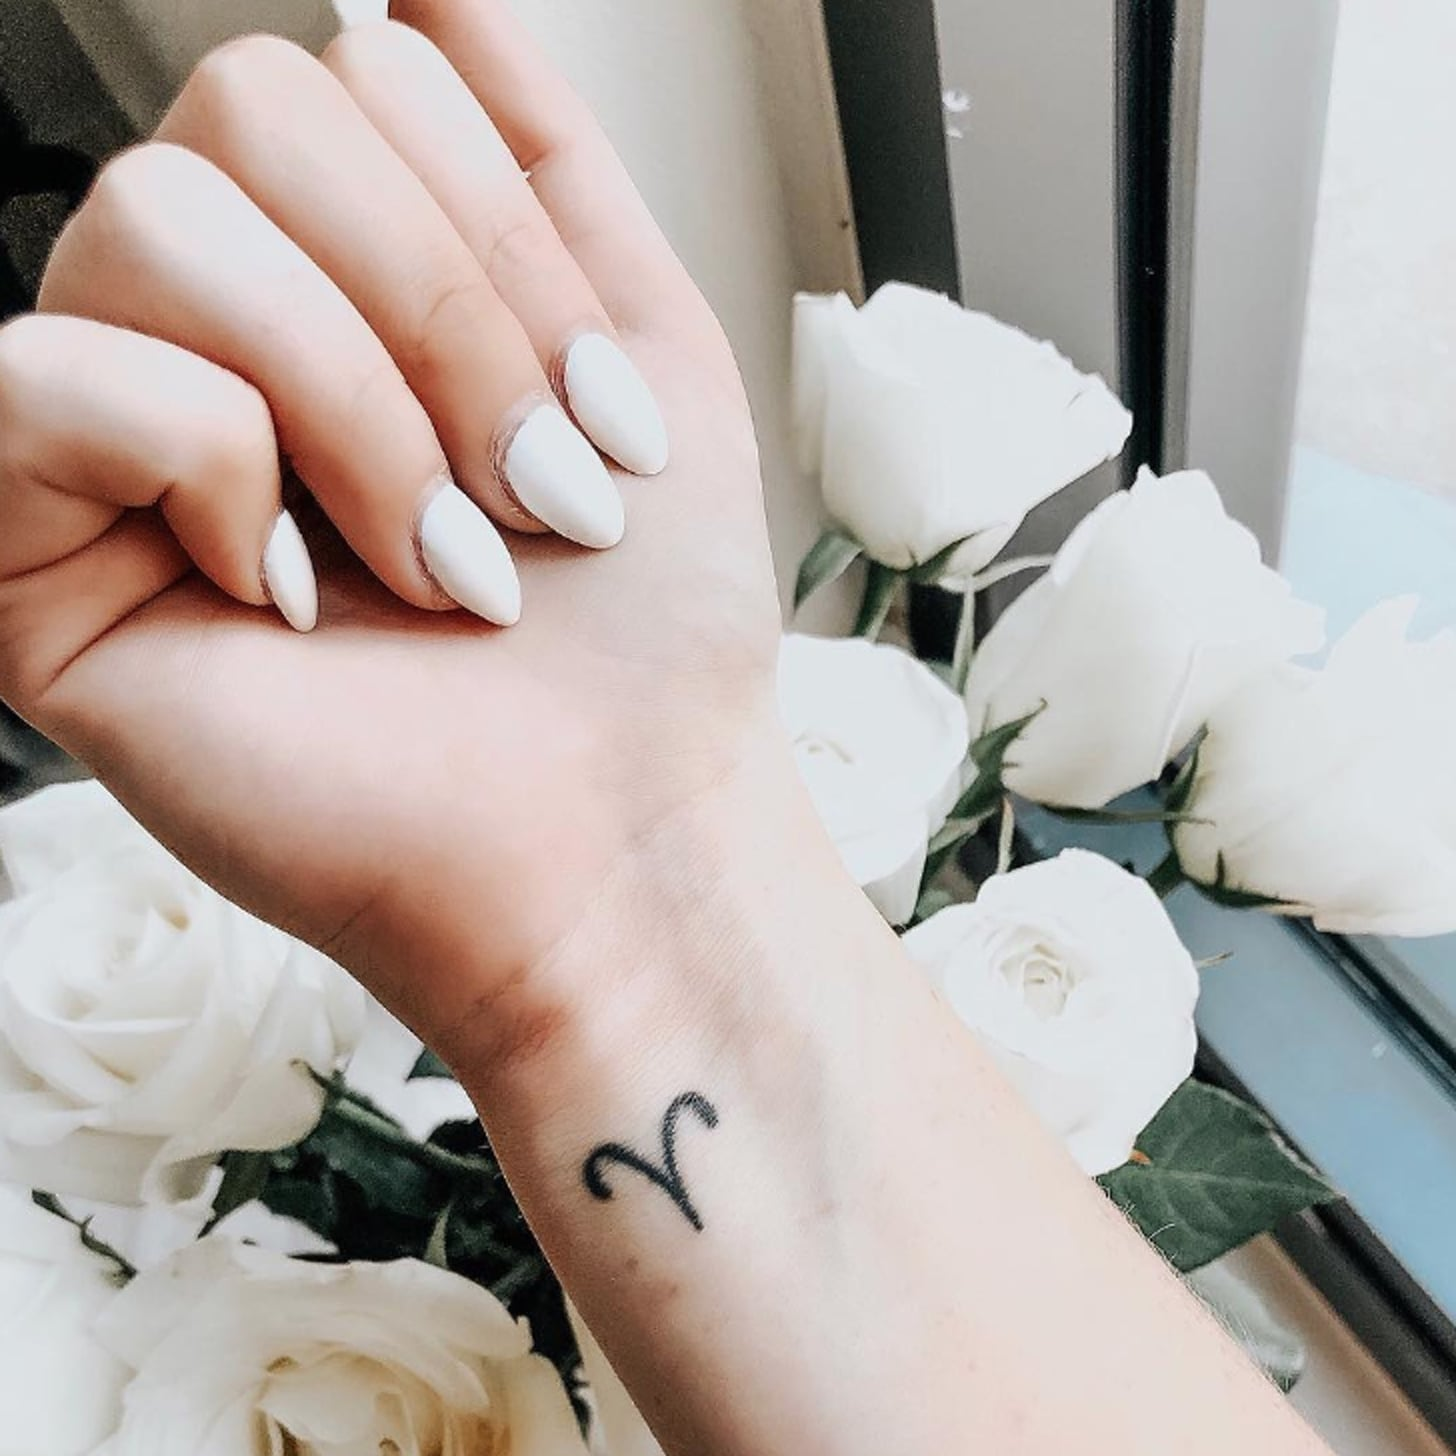 1a7c8c726 Zodiac Sign Tattoo Ideas   POPSUGAR Love & Sex